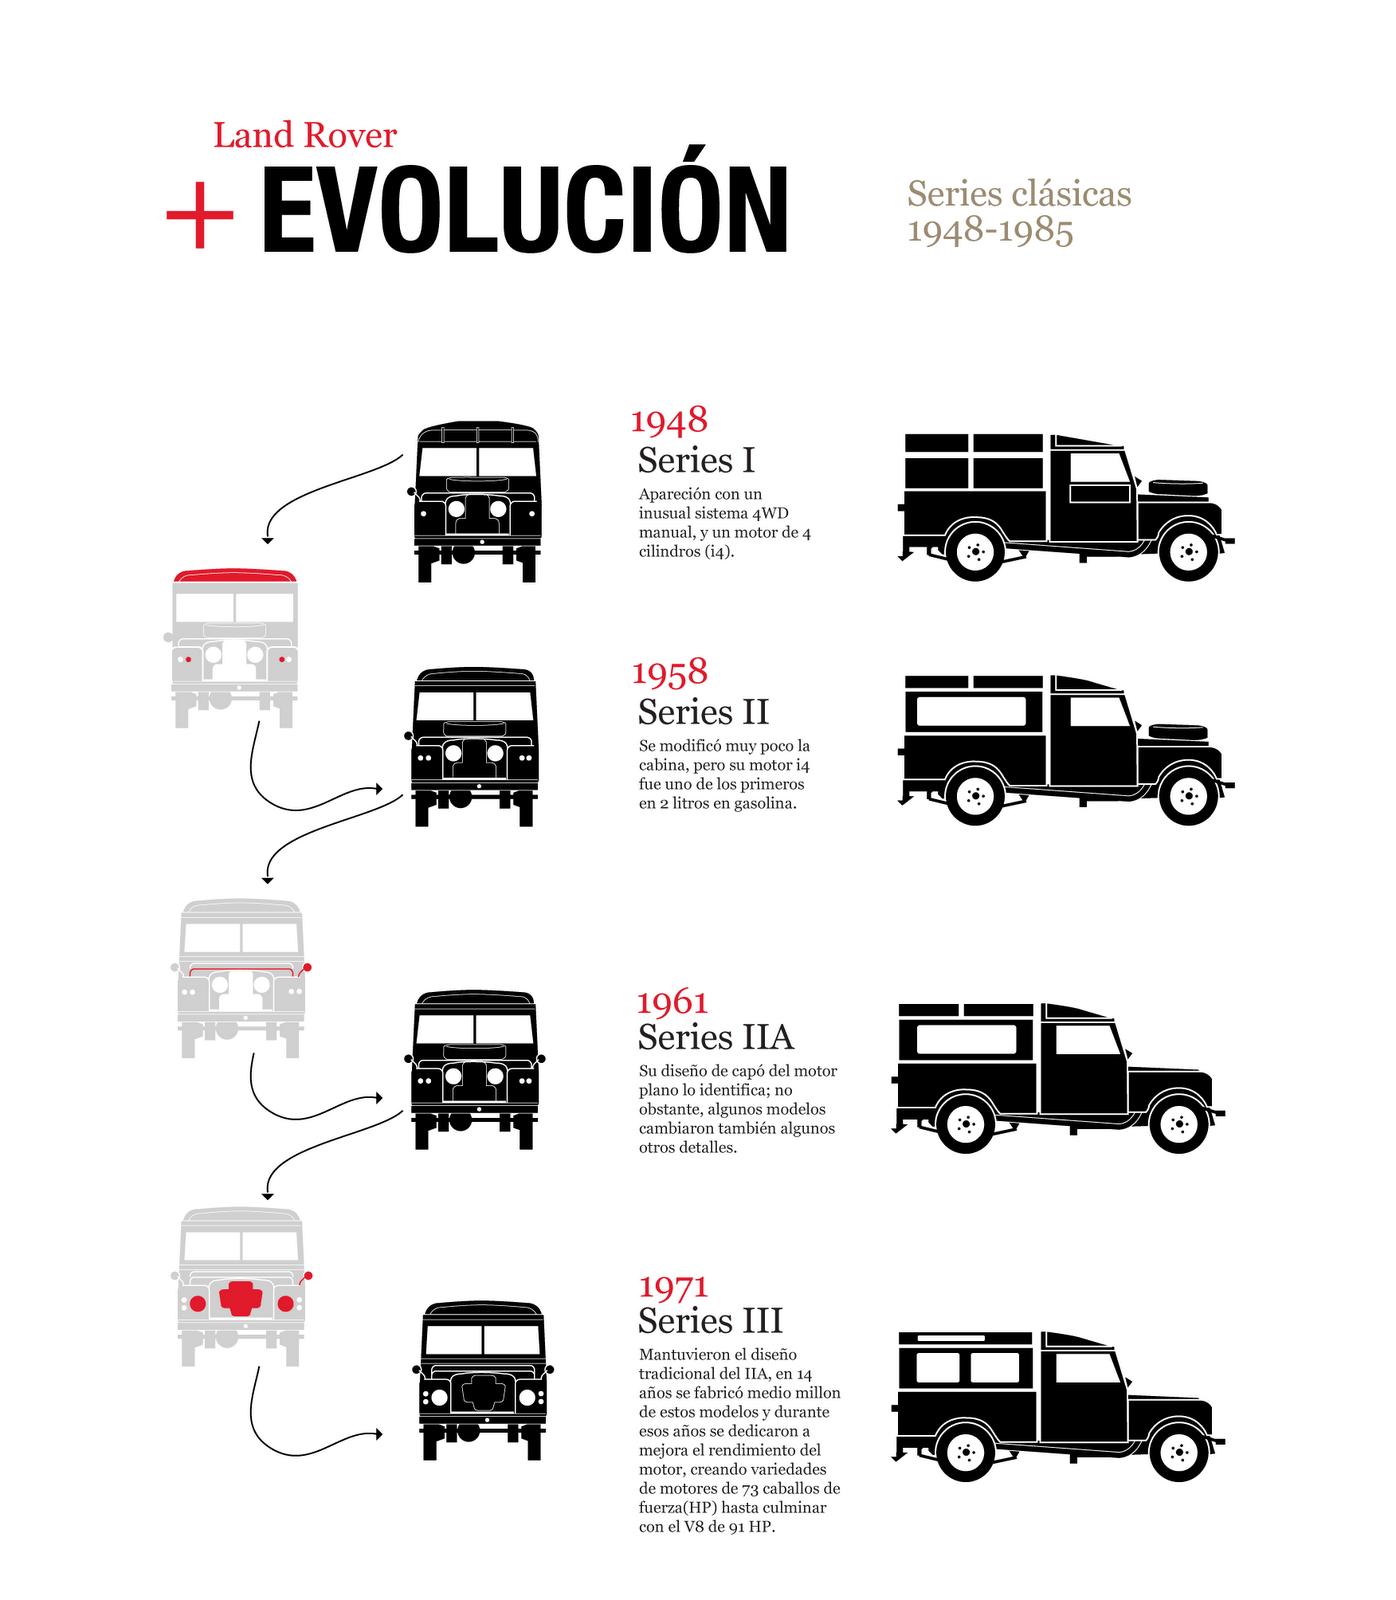 land rover evolution 1948